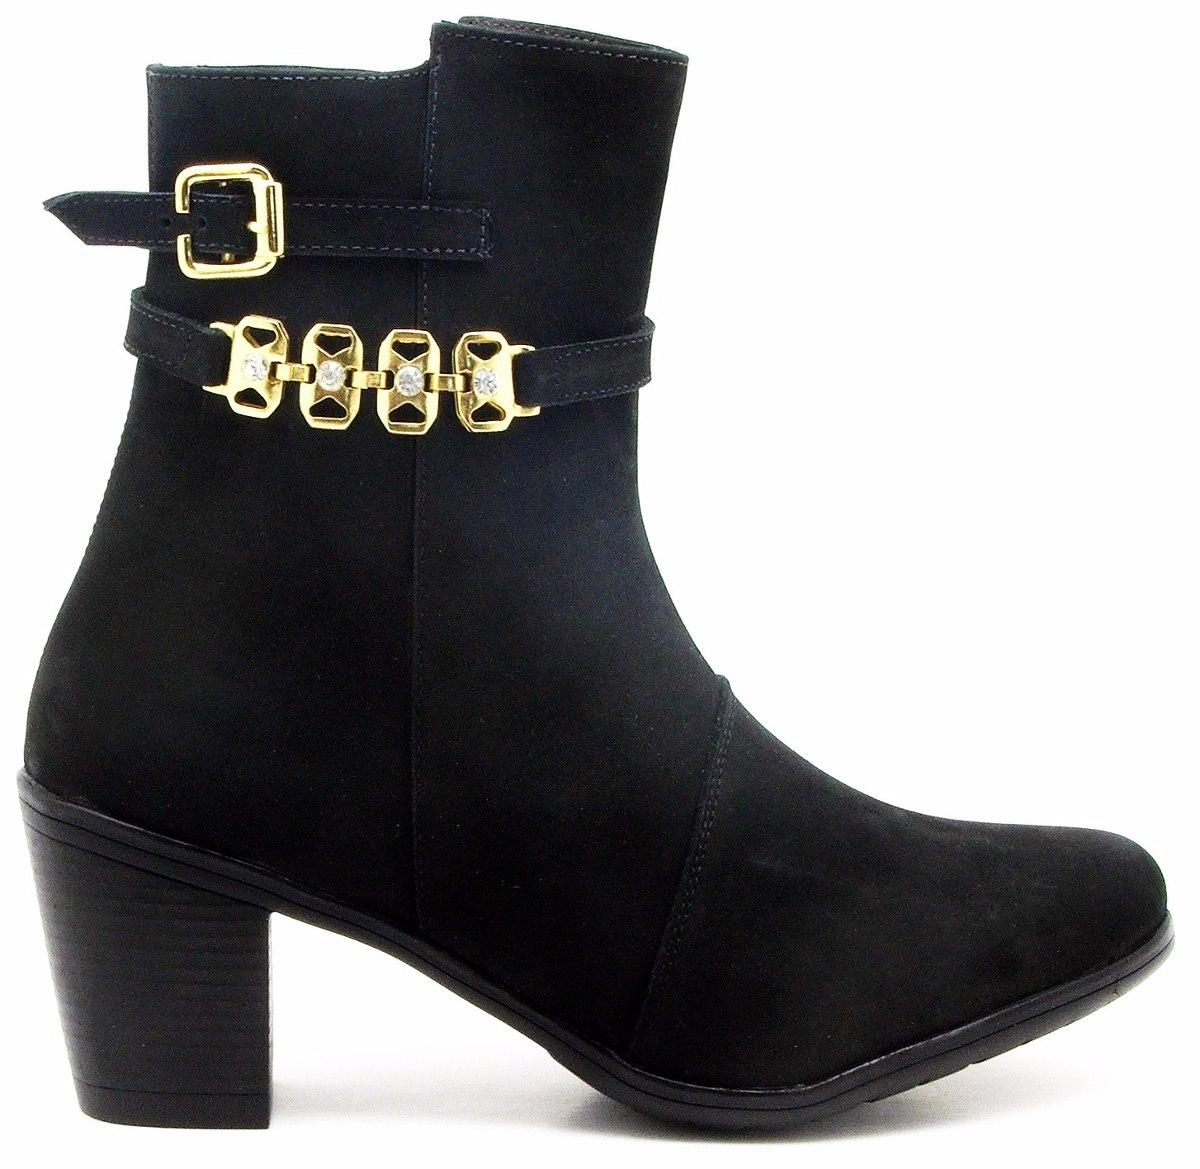 ddddbdf57 coturno feminino bota cano curto couro preto estiloso blog. Carregando zoom.